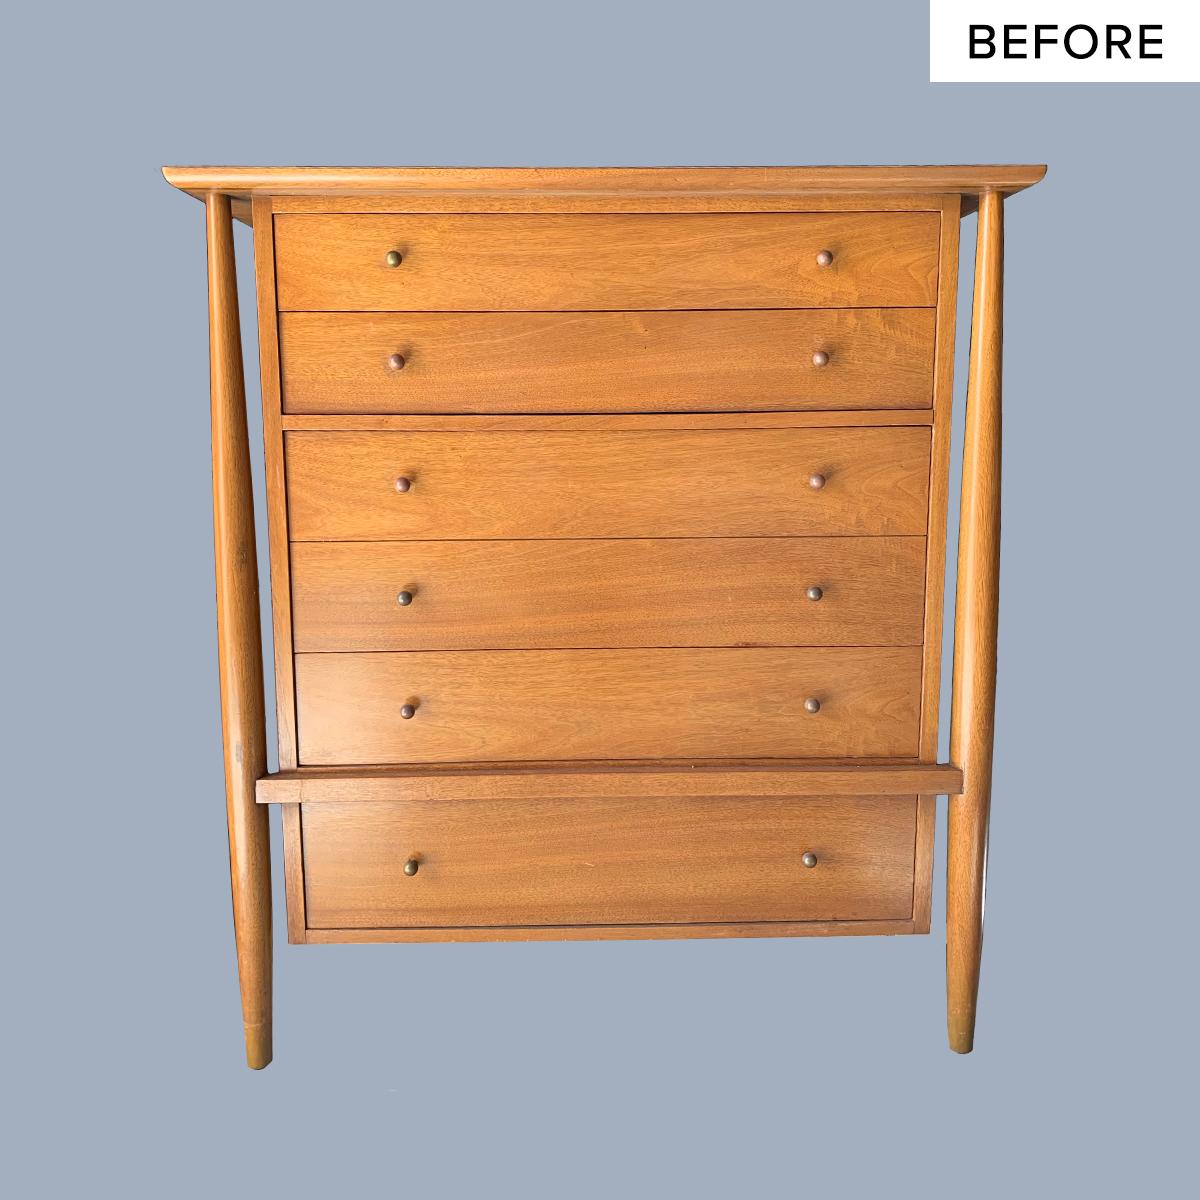 Vintage furniture restoration San Francisco Bay Area & Los Angeles